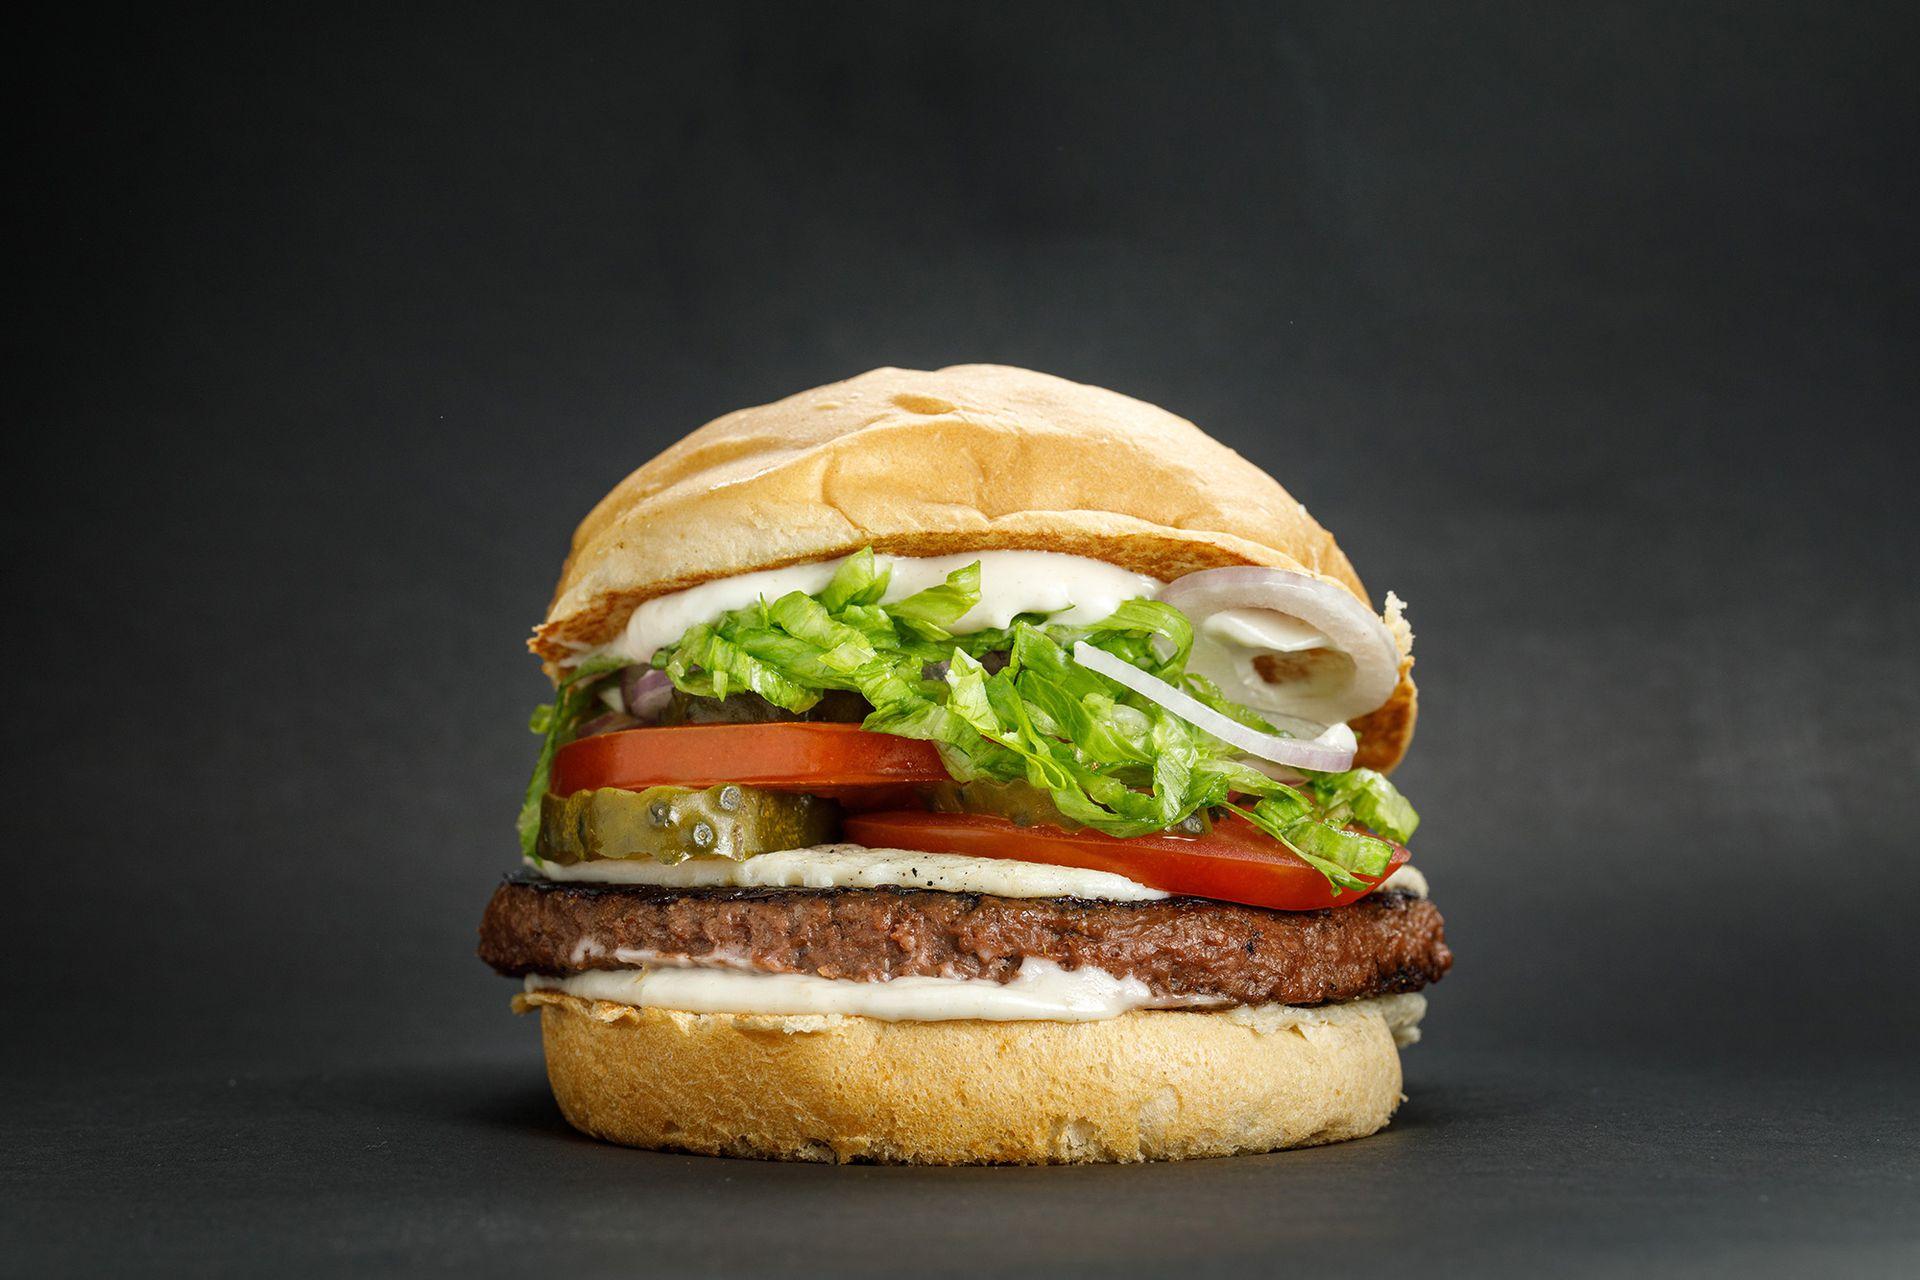 Not kevin, la burger plant based de Kevin Bacon